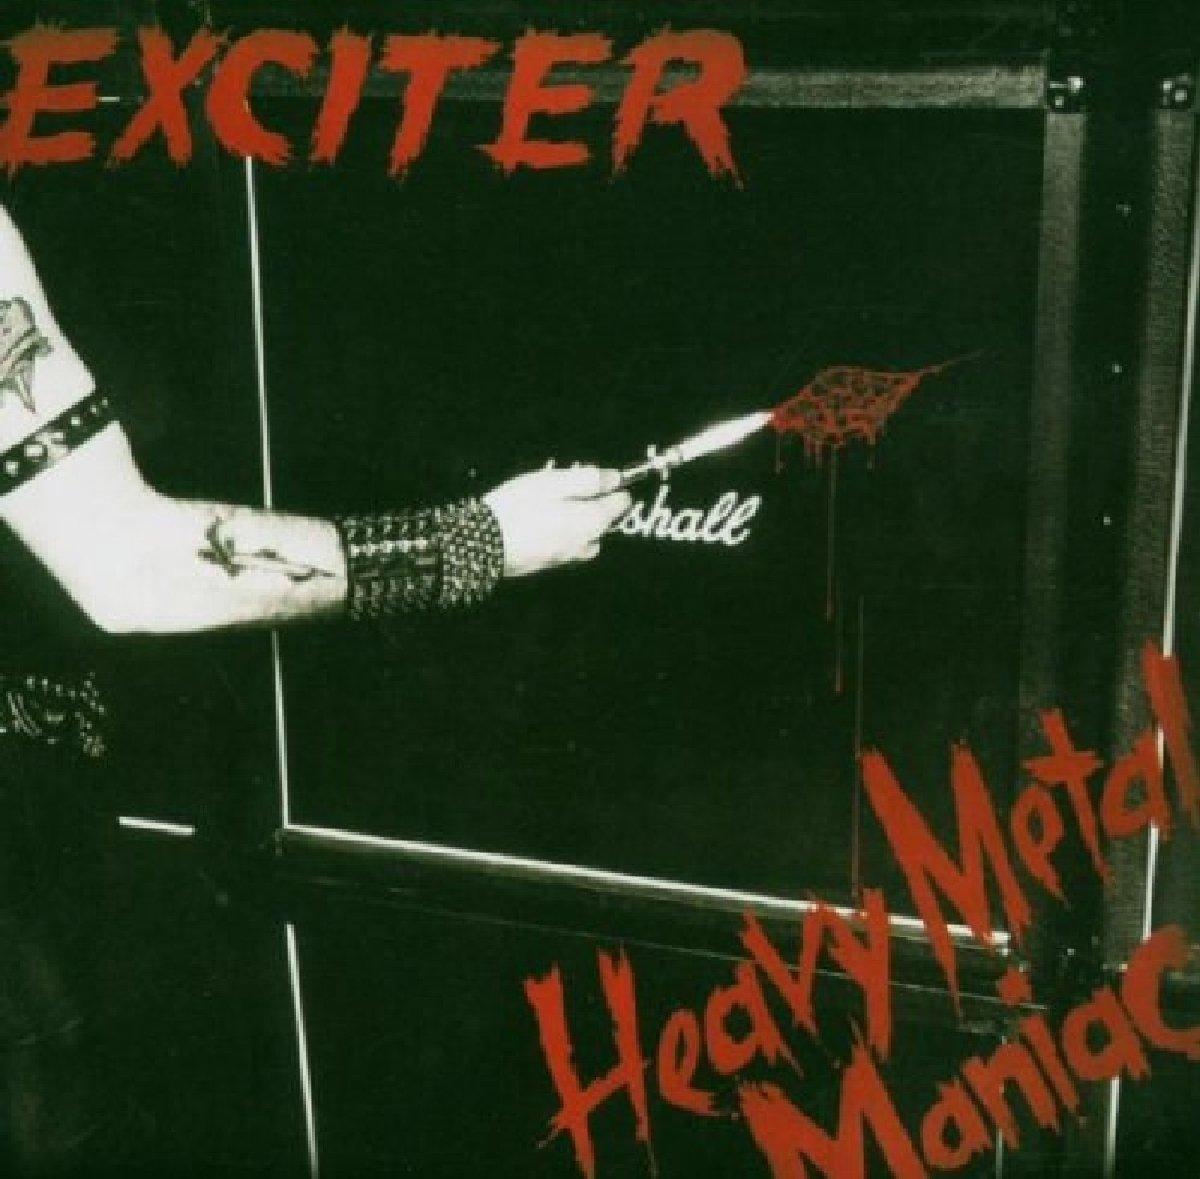 CD : Exciter - Heavy Metal Maniac (CD)